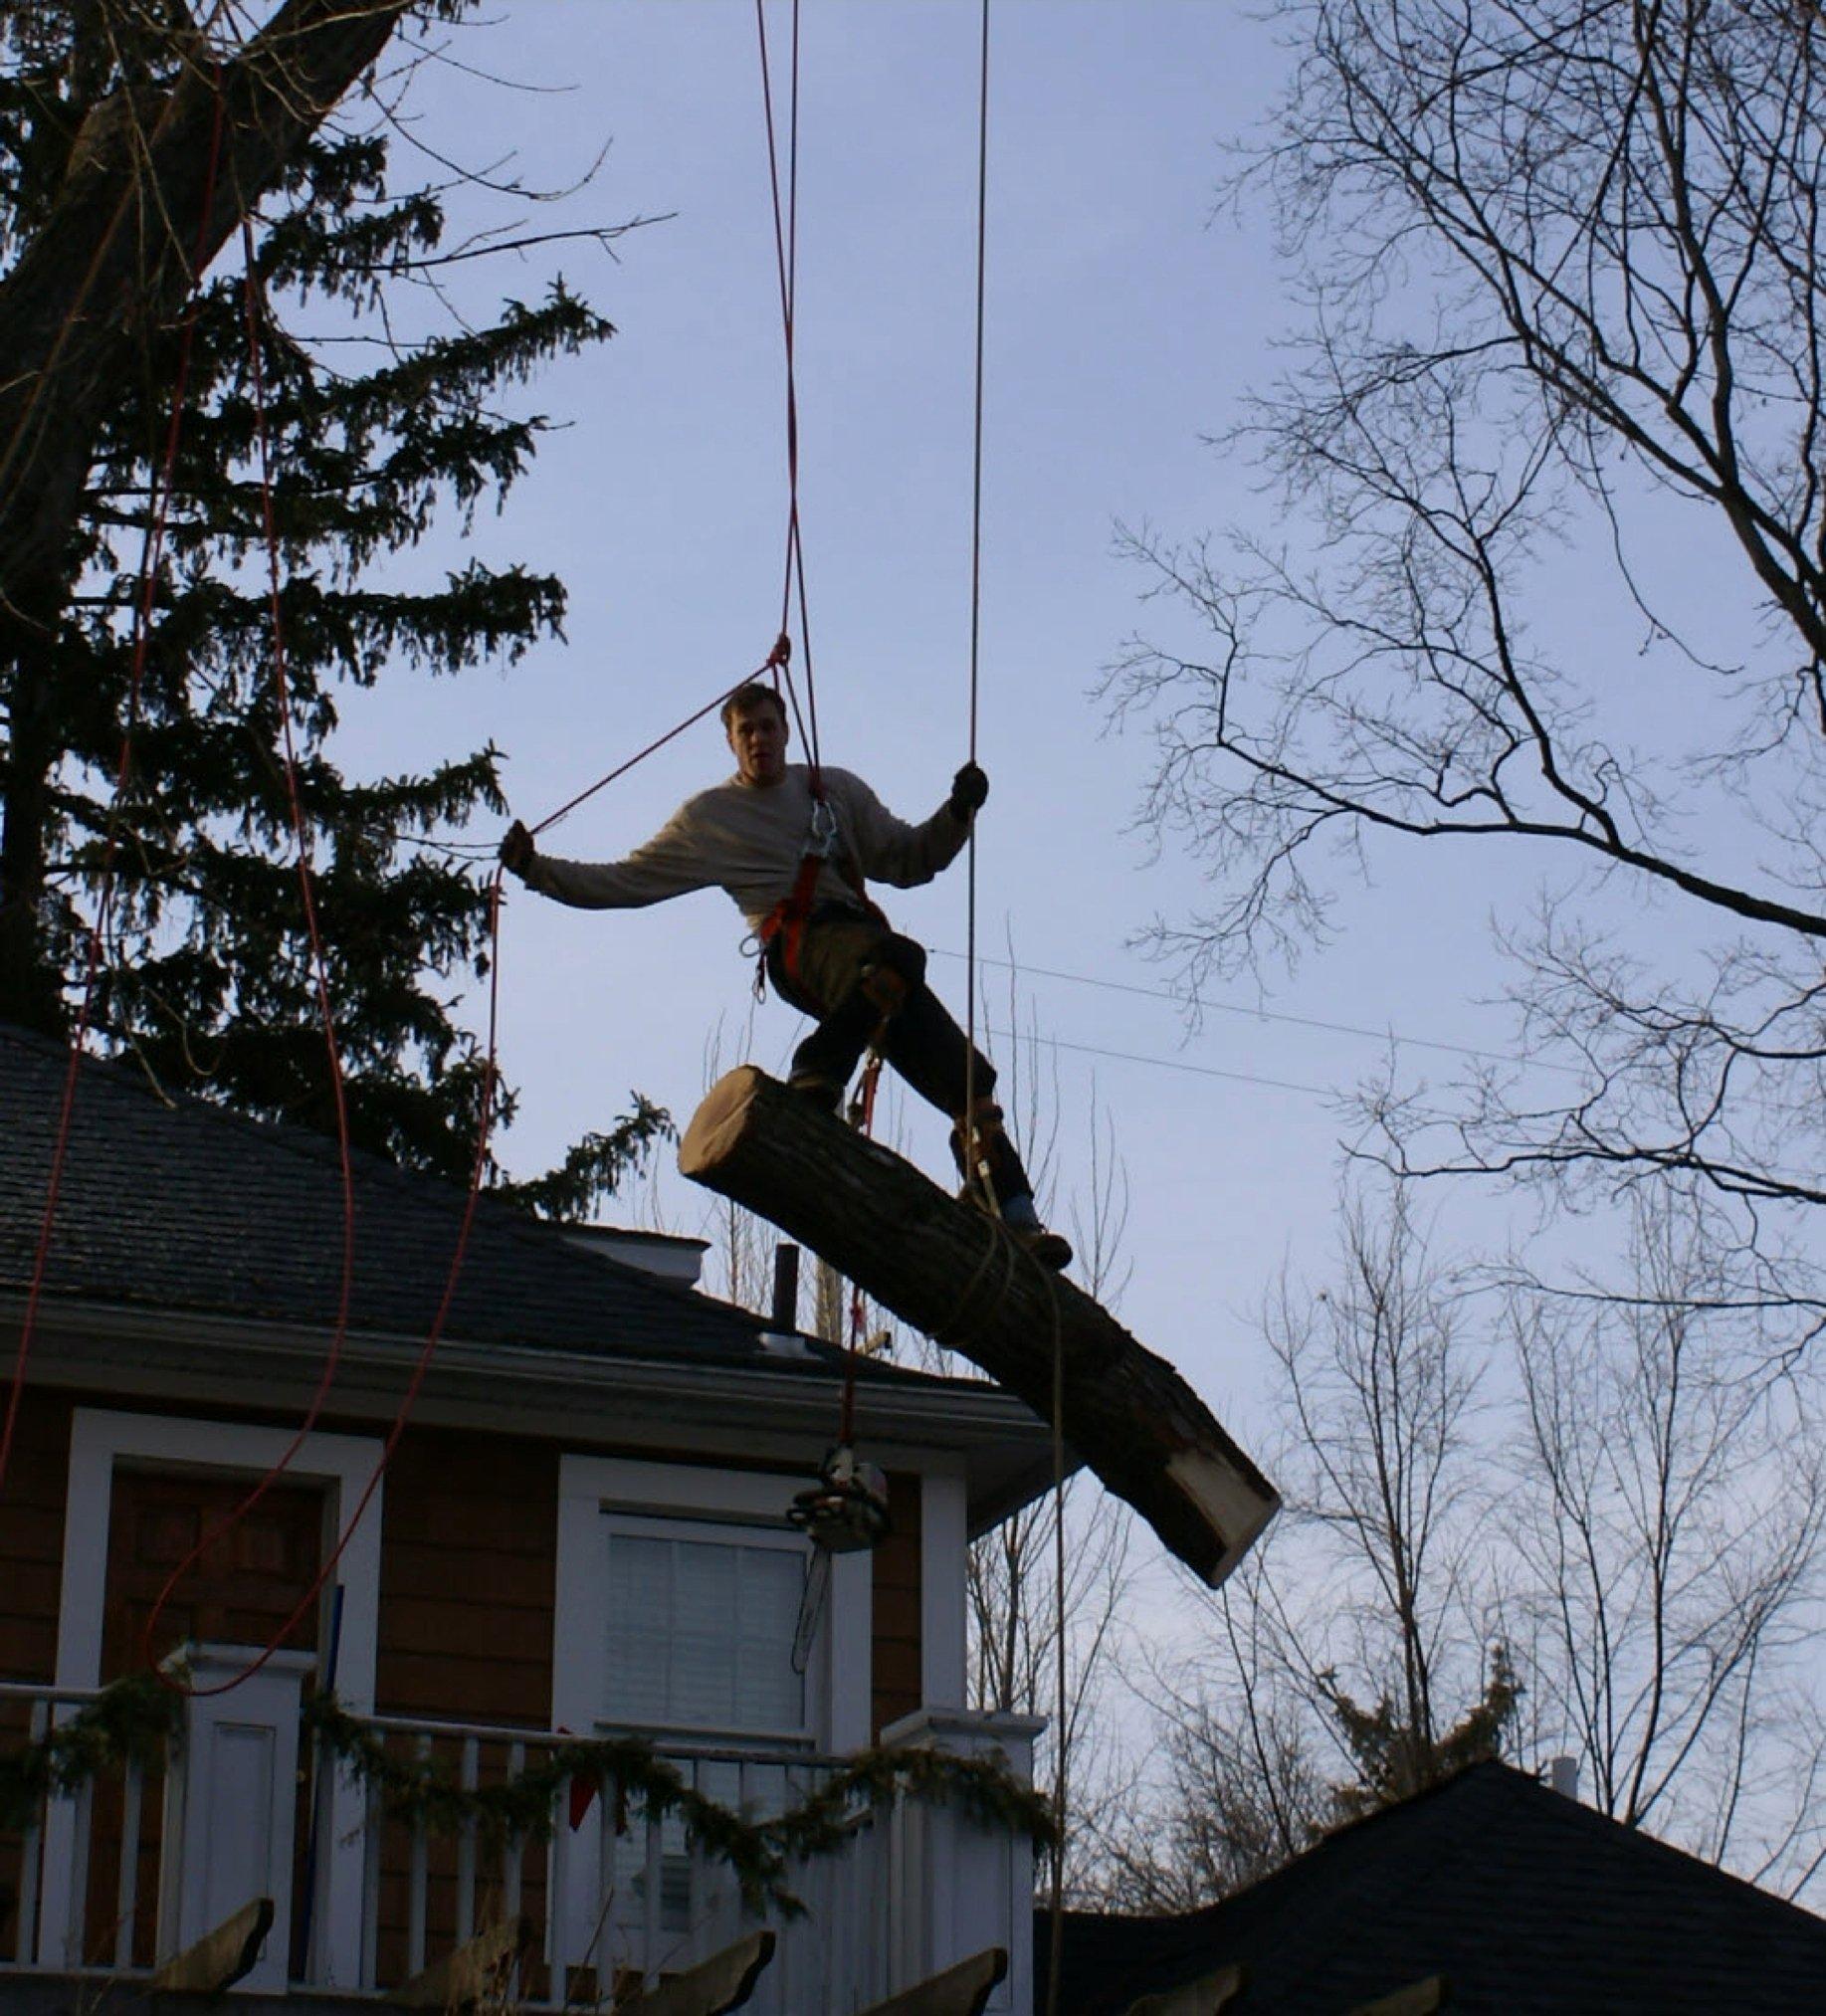 Tree Trimming Estimate Template Elegant Royal Oak Michigan Tree Service